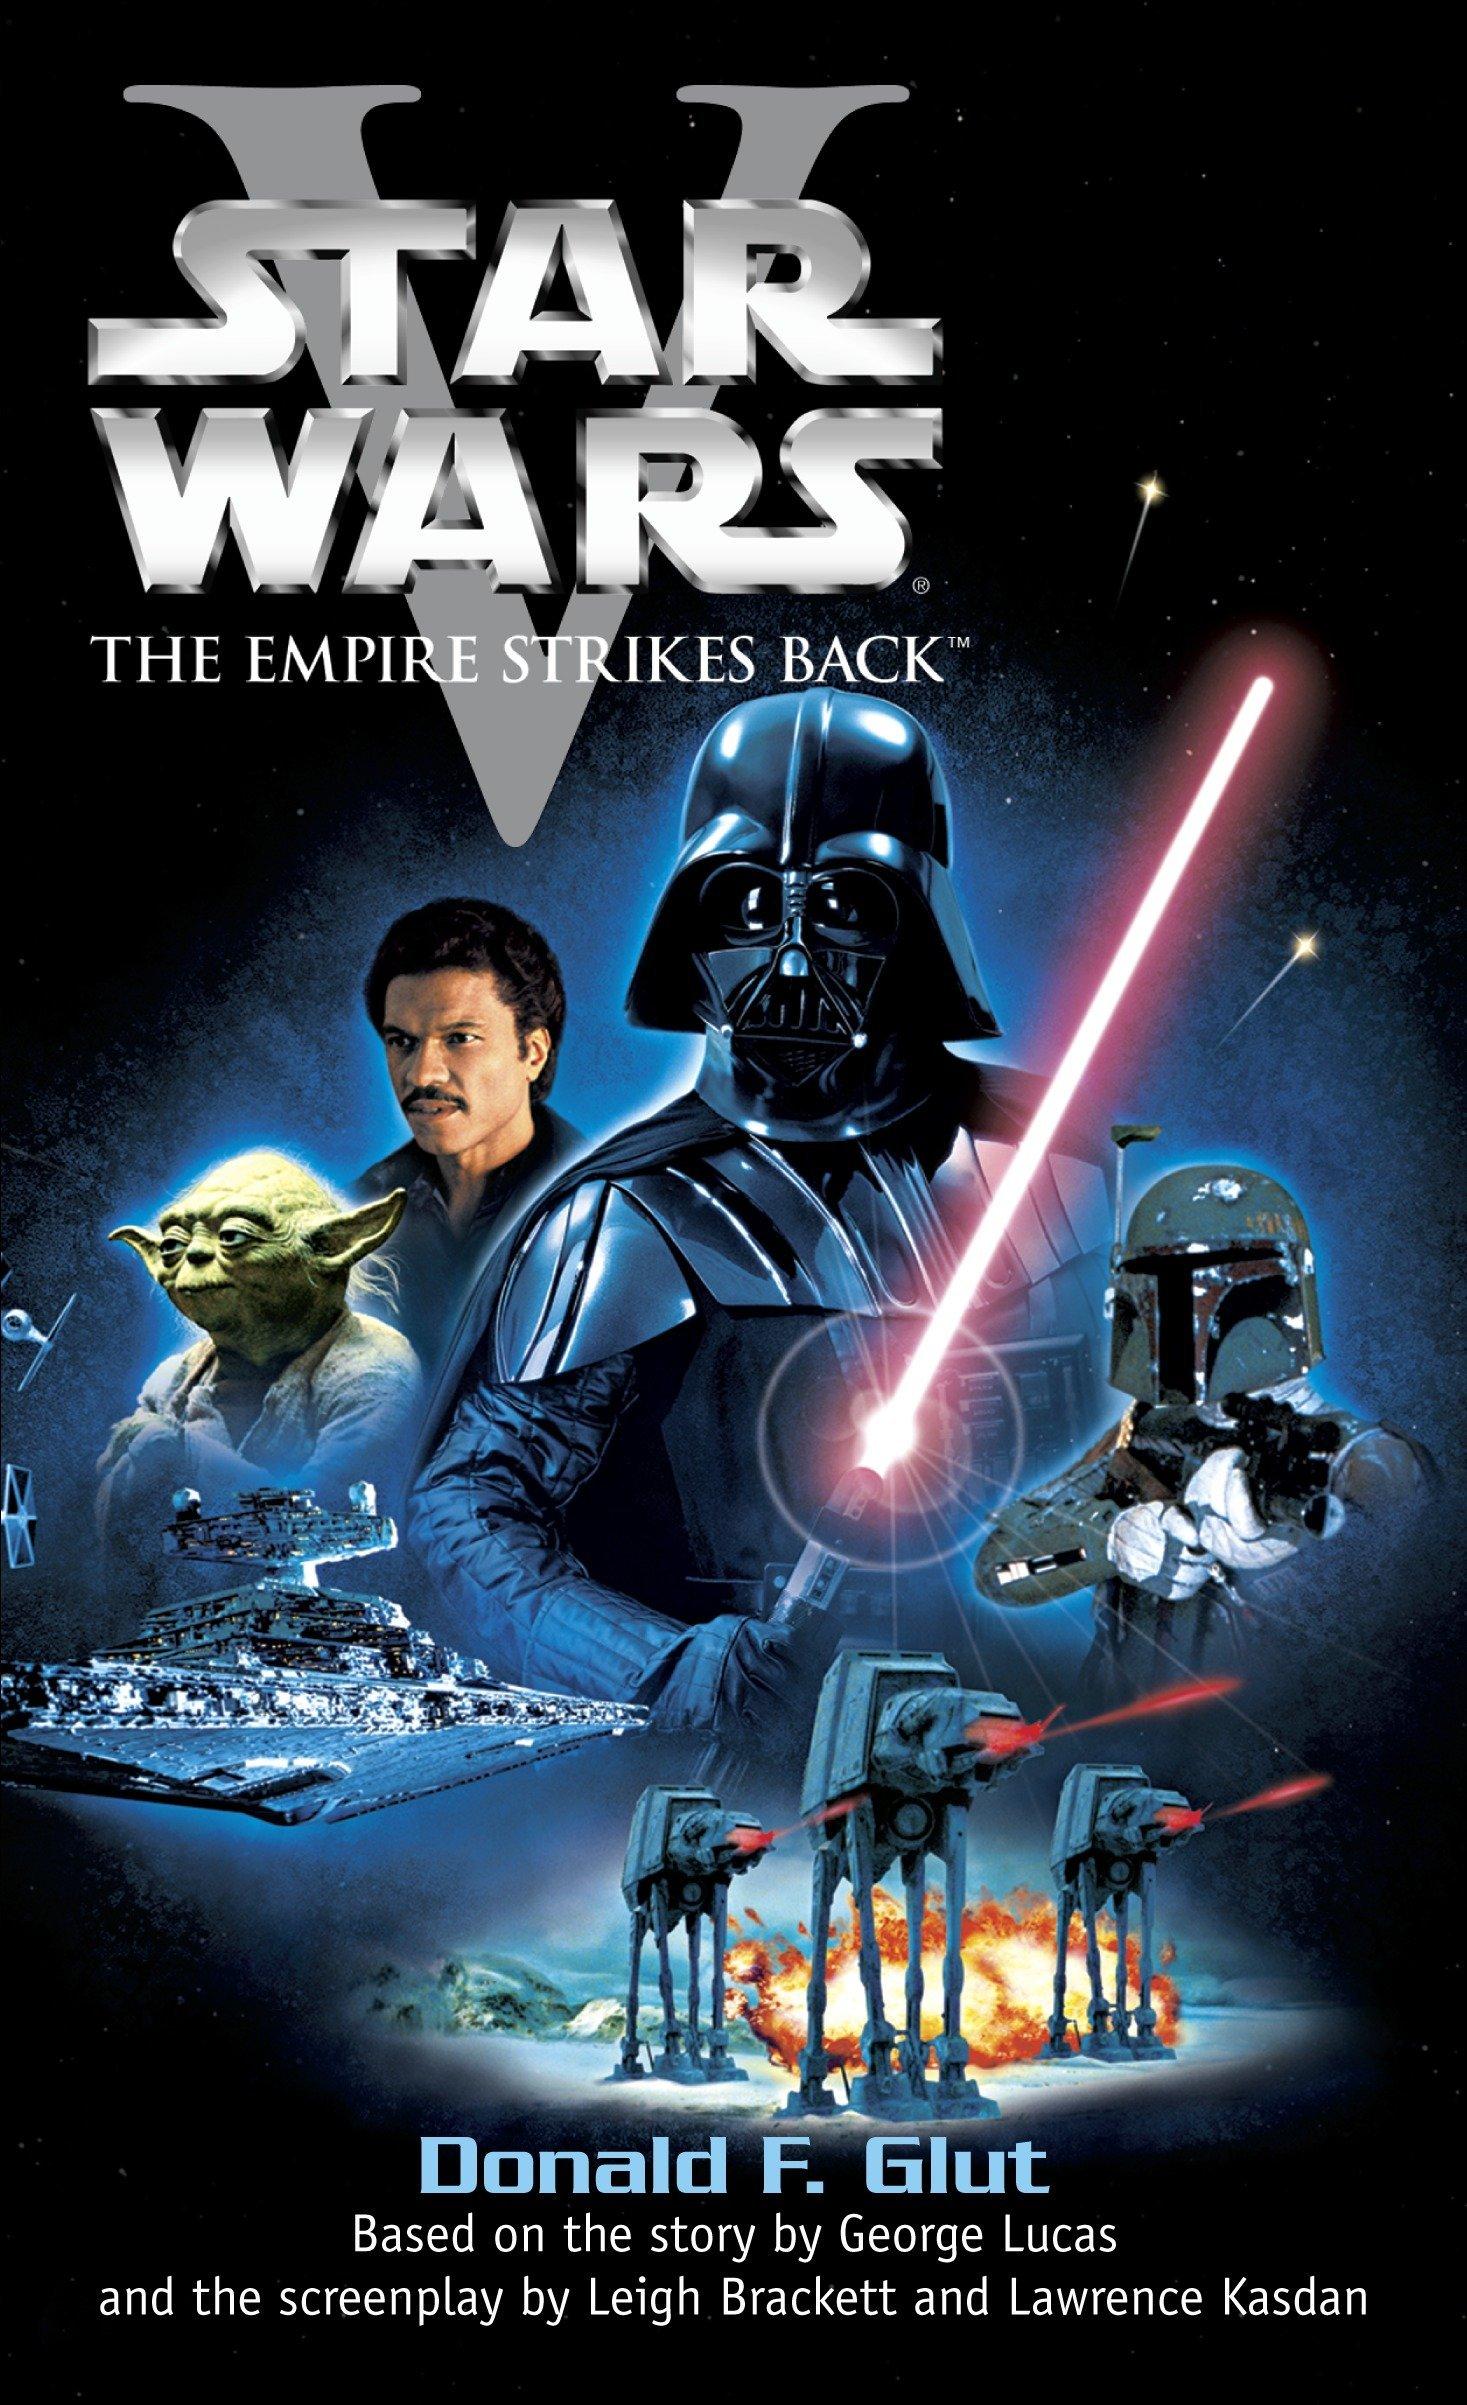 Star war empire strikes back FAST SHIPPING Beautiful 17 inch x 24 inch